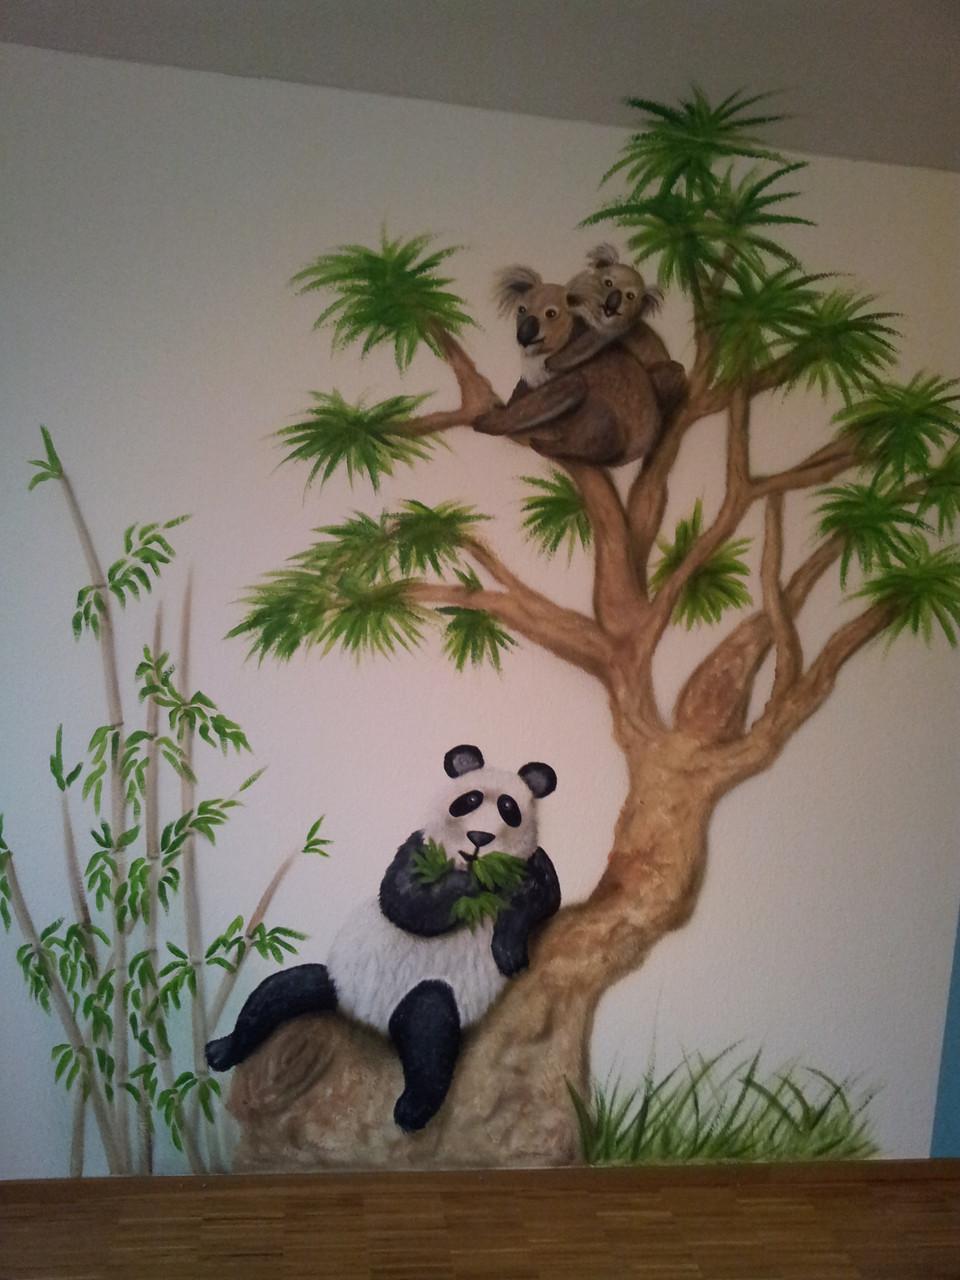 Koalabär und Pandabär vereint